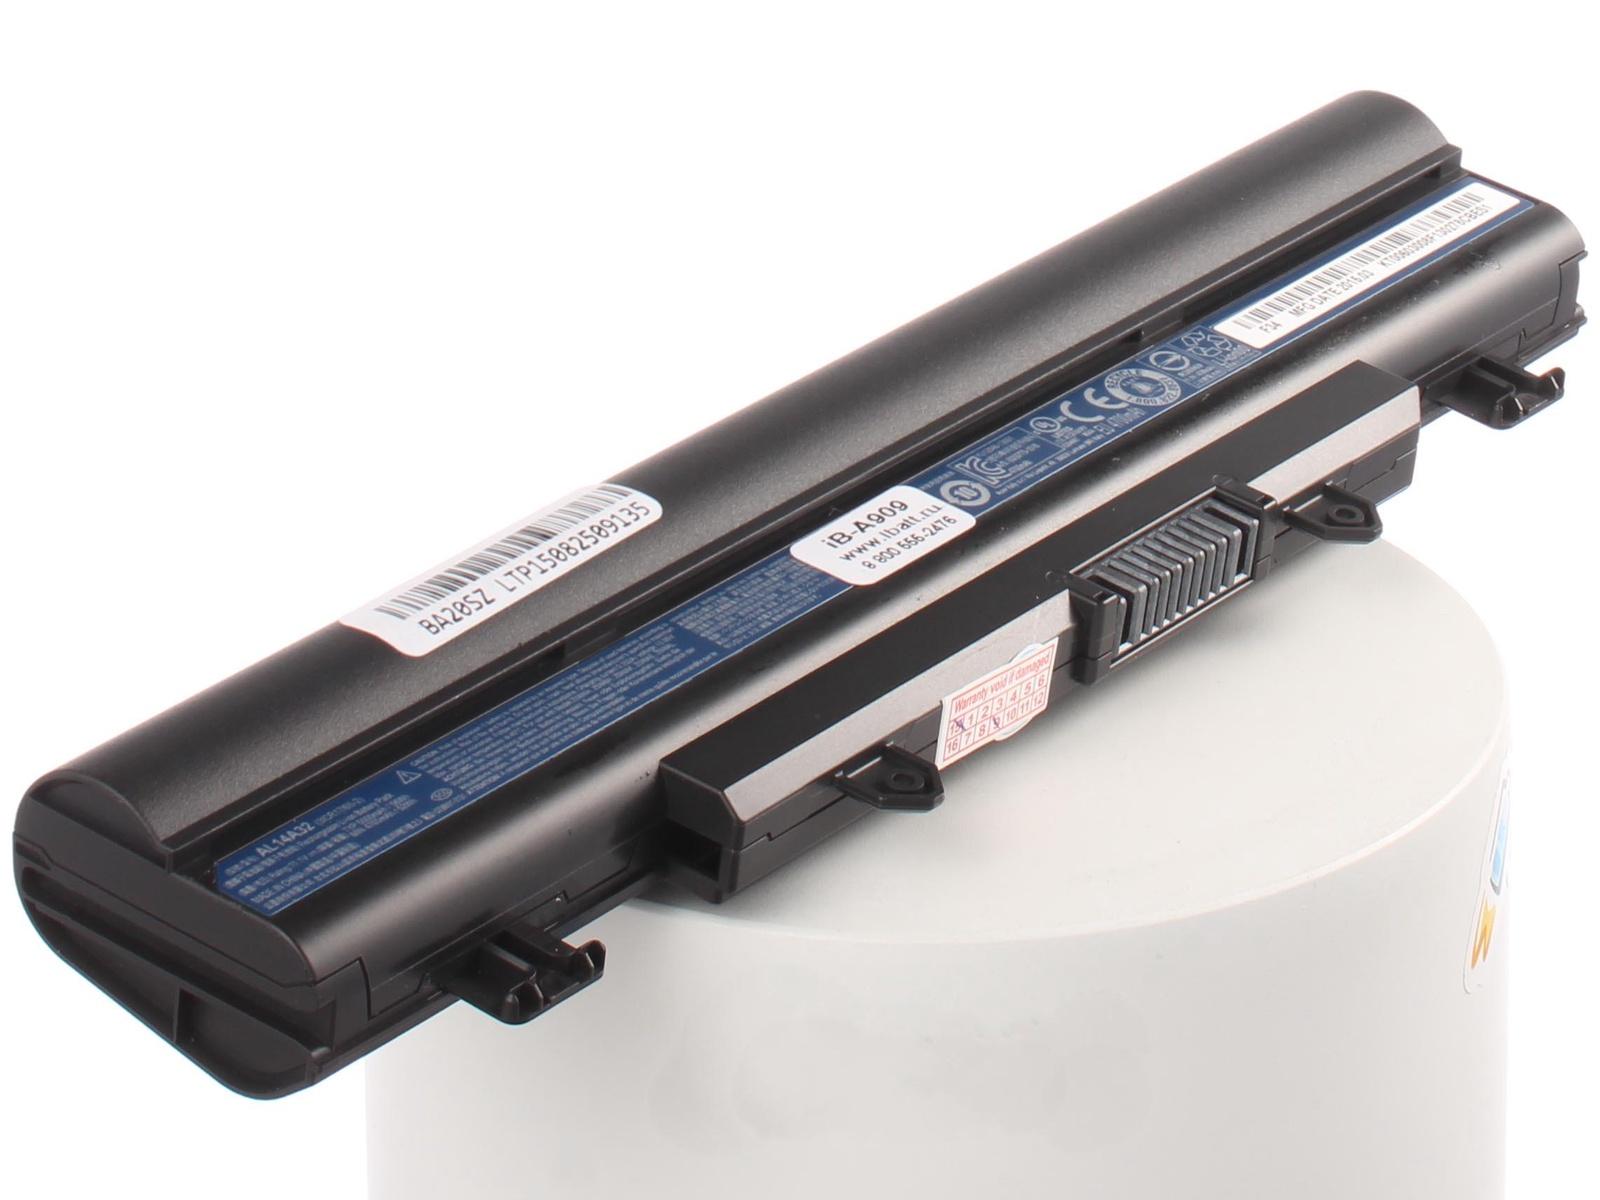 Аккумулятор для ноутбука iBatt для Acer Aspire E5-571-577J, Aspire V3-572G-53PQ, Extensa 2510G-39P8, ASPIRE E5-511-C4AH, Aspire E5-571G-52FL, Aspire E14, Aspire E5-571G-366P, Aspire E5-571G-571L, ASPIRE E5-551G-T54A acer aspire e5 573 331j